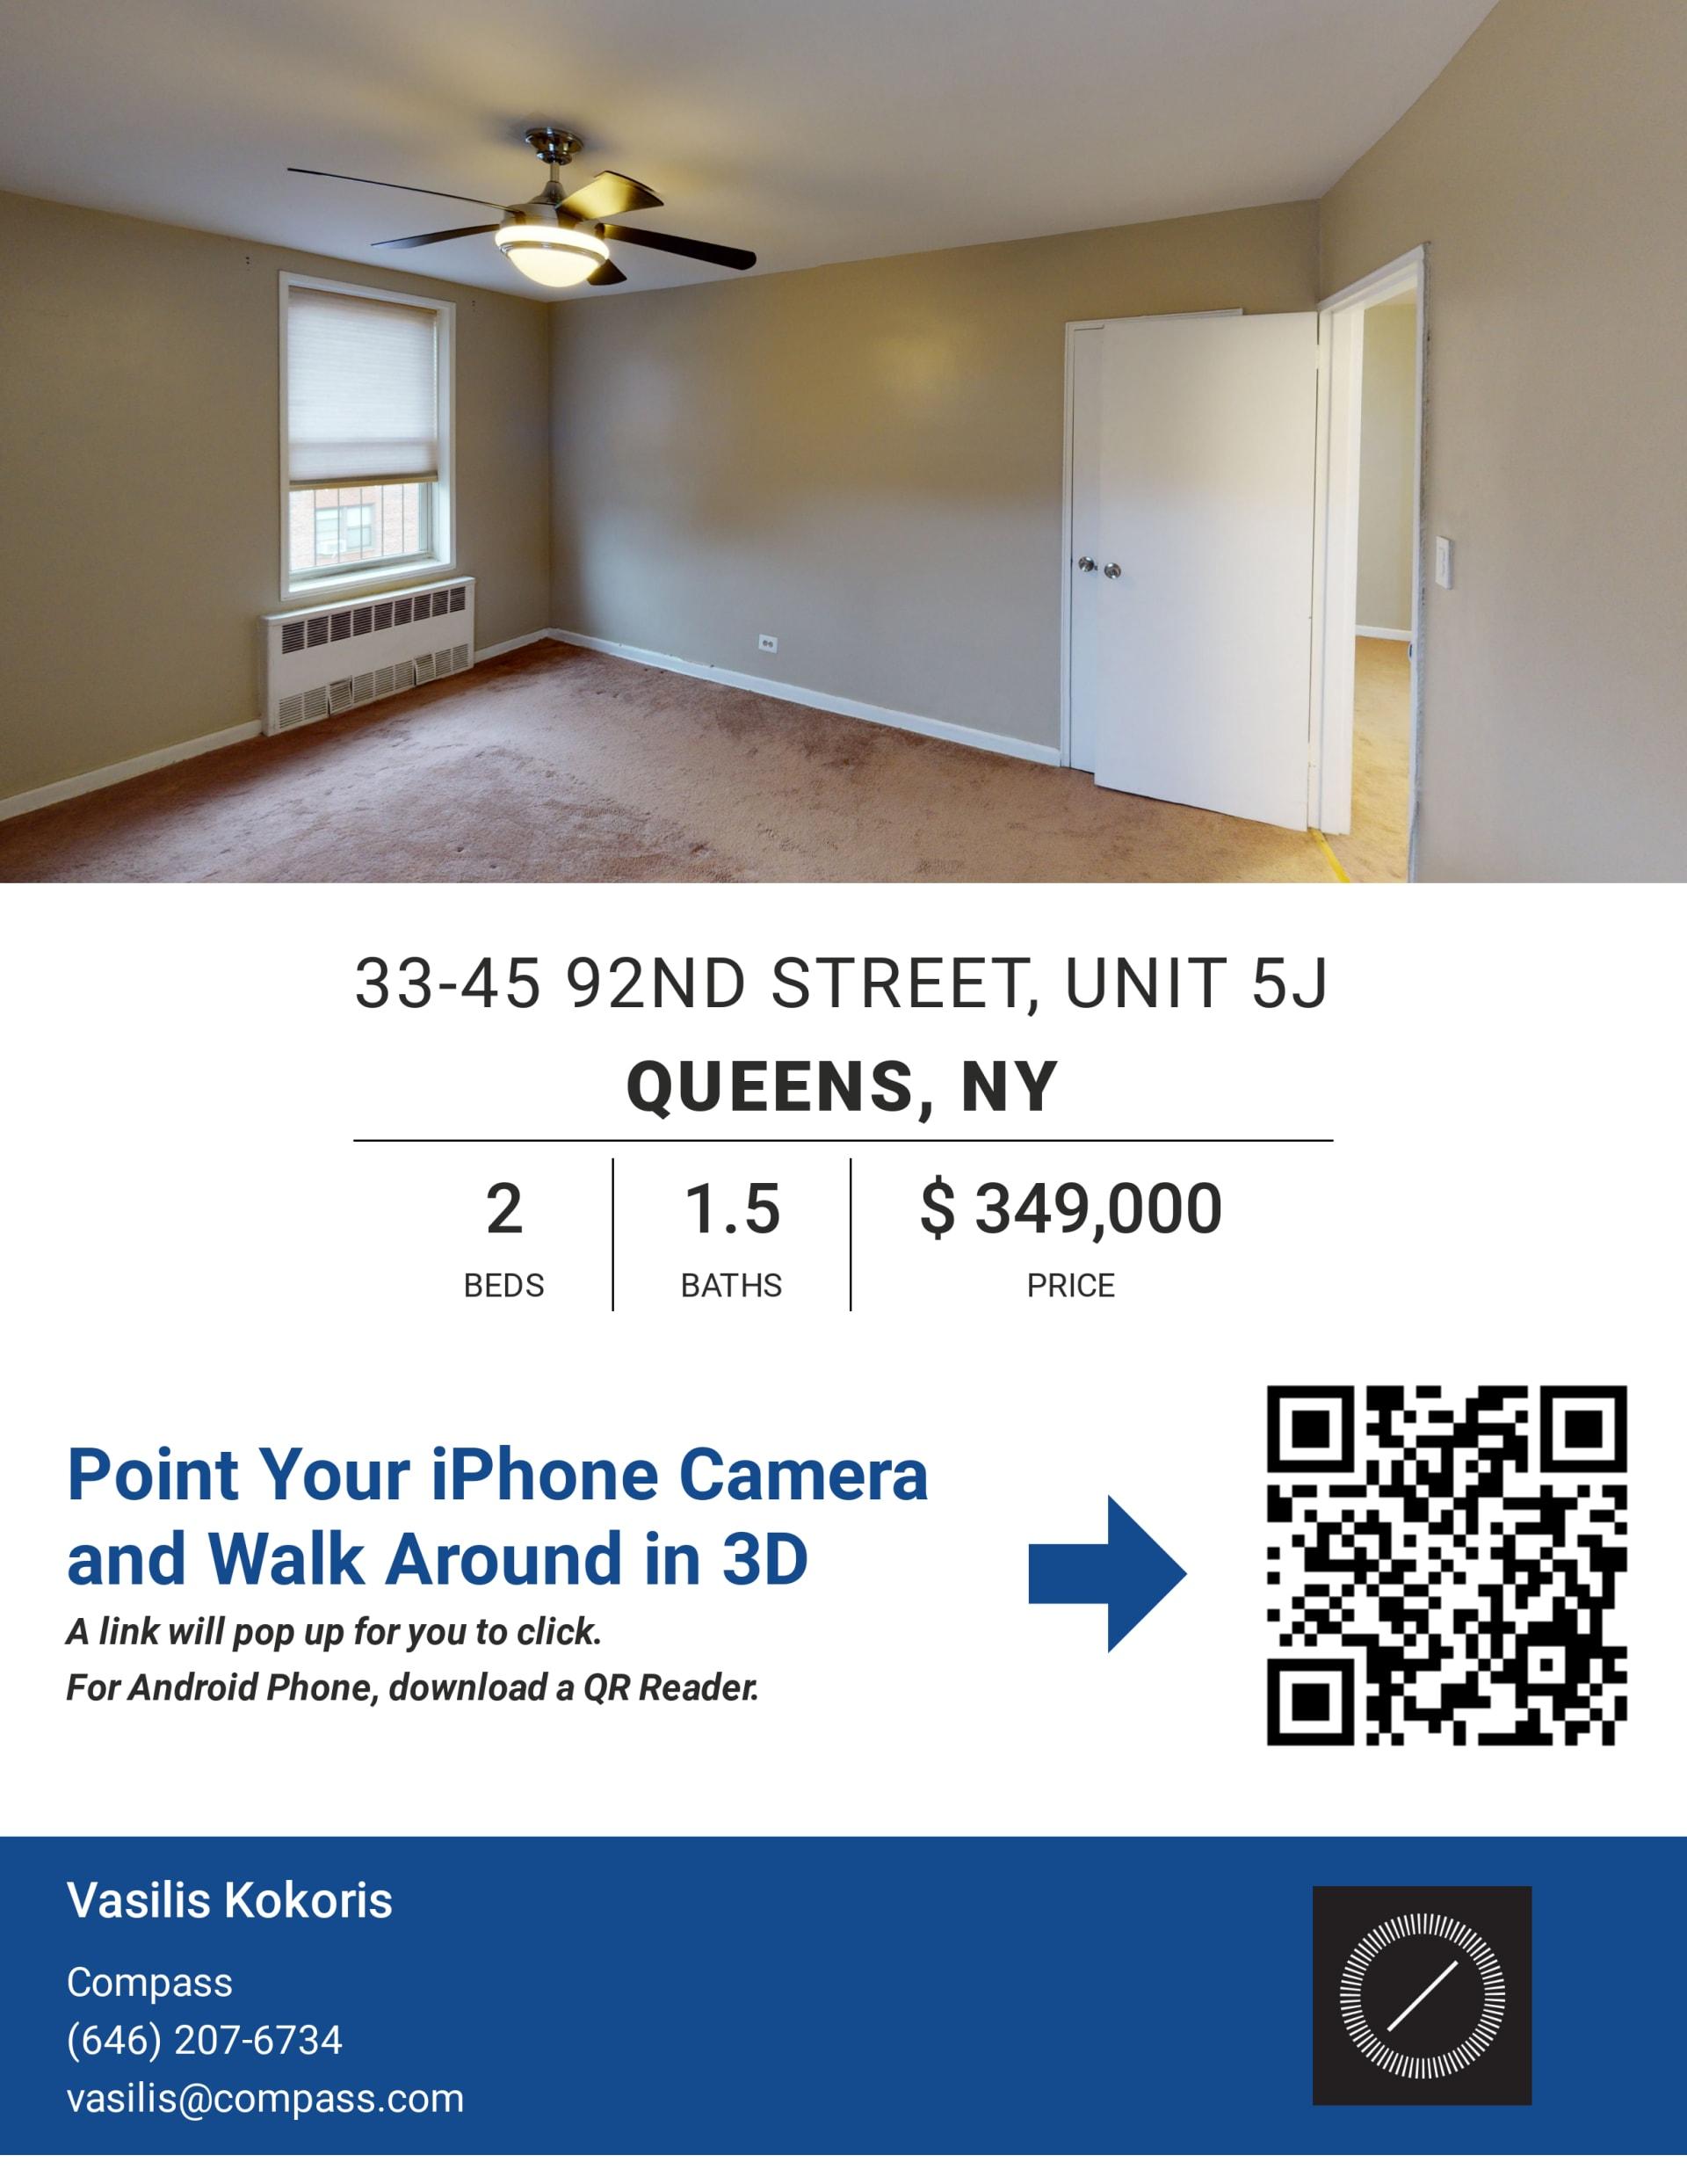 33-45 92nd Street Unit 5J photo